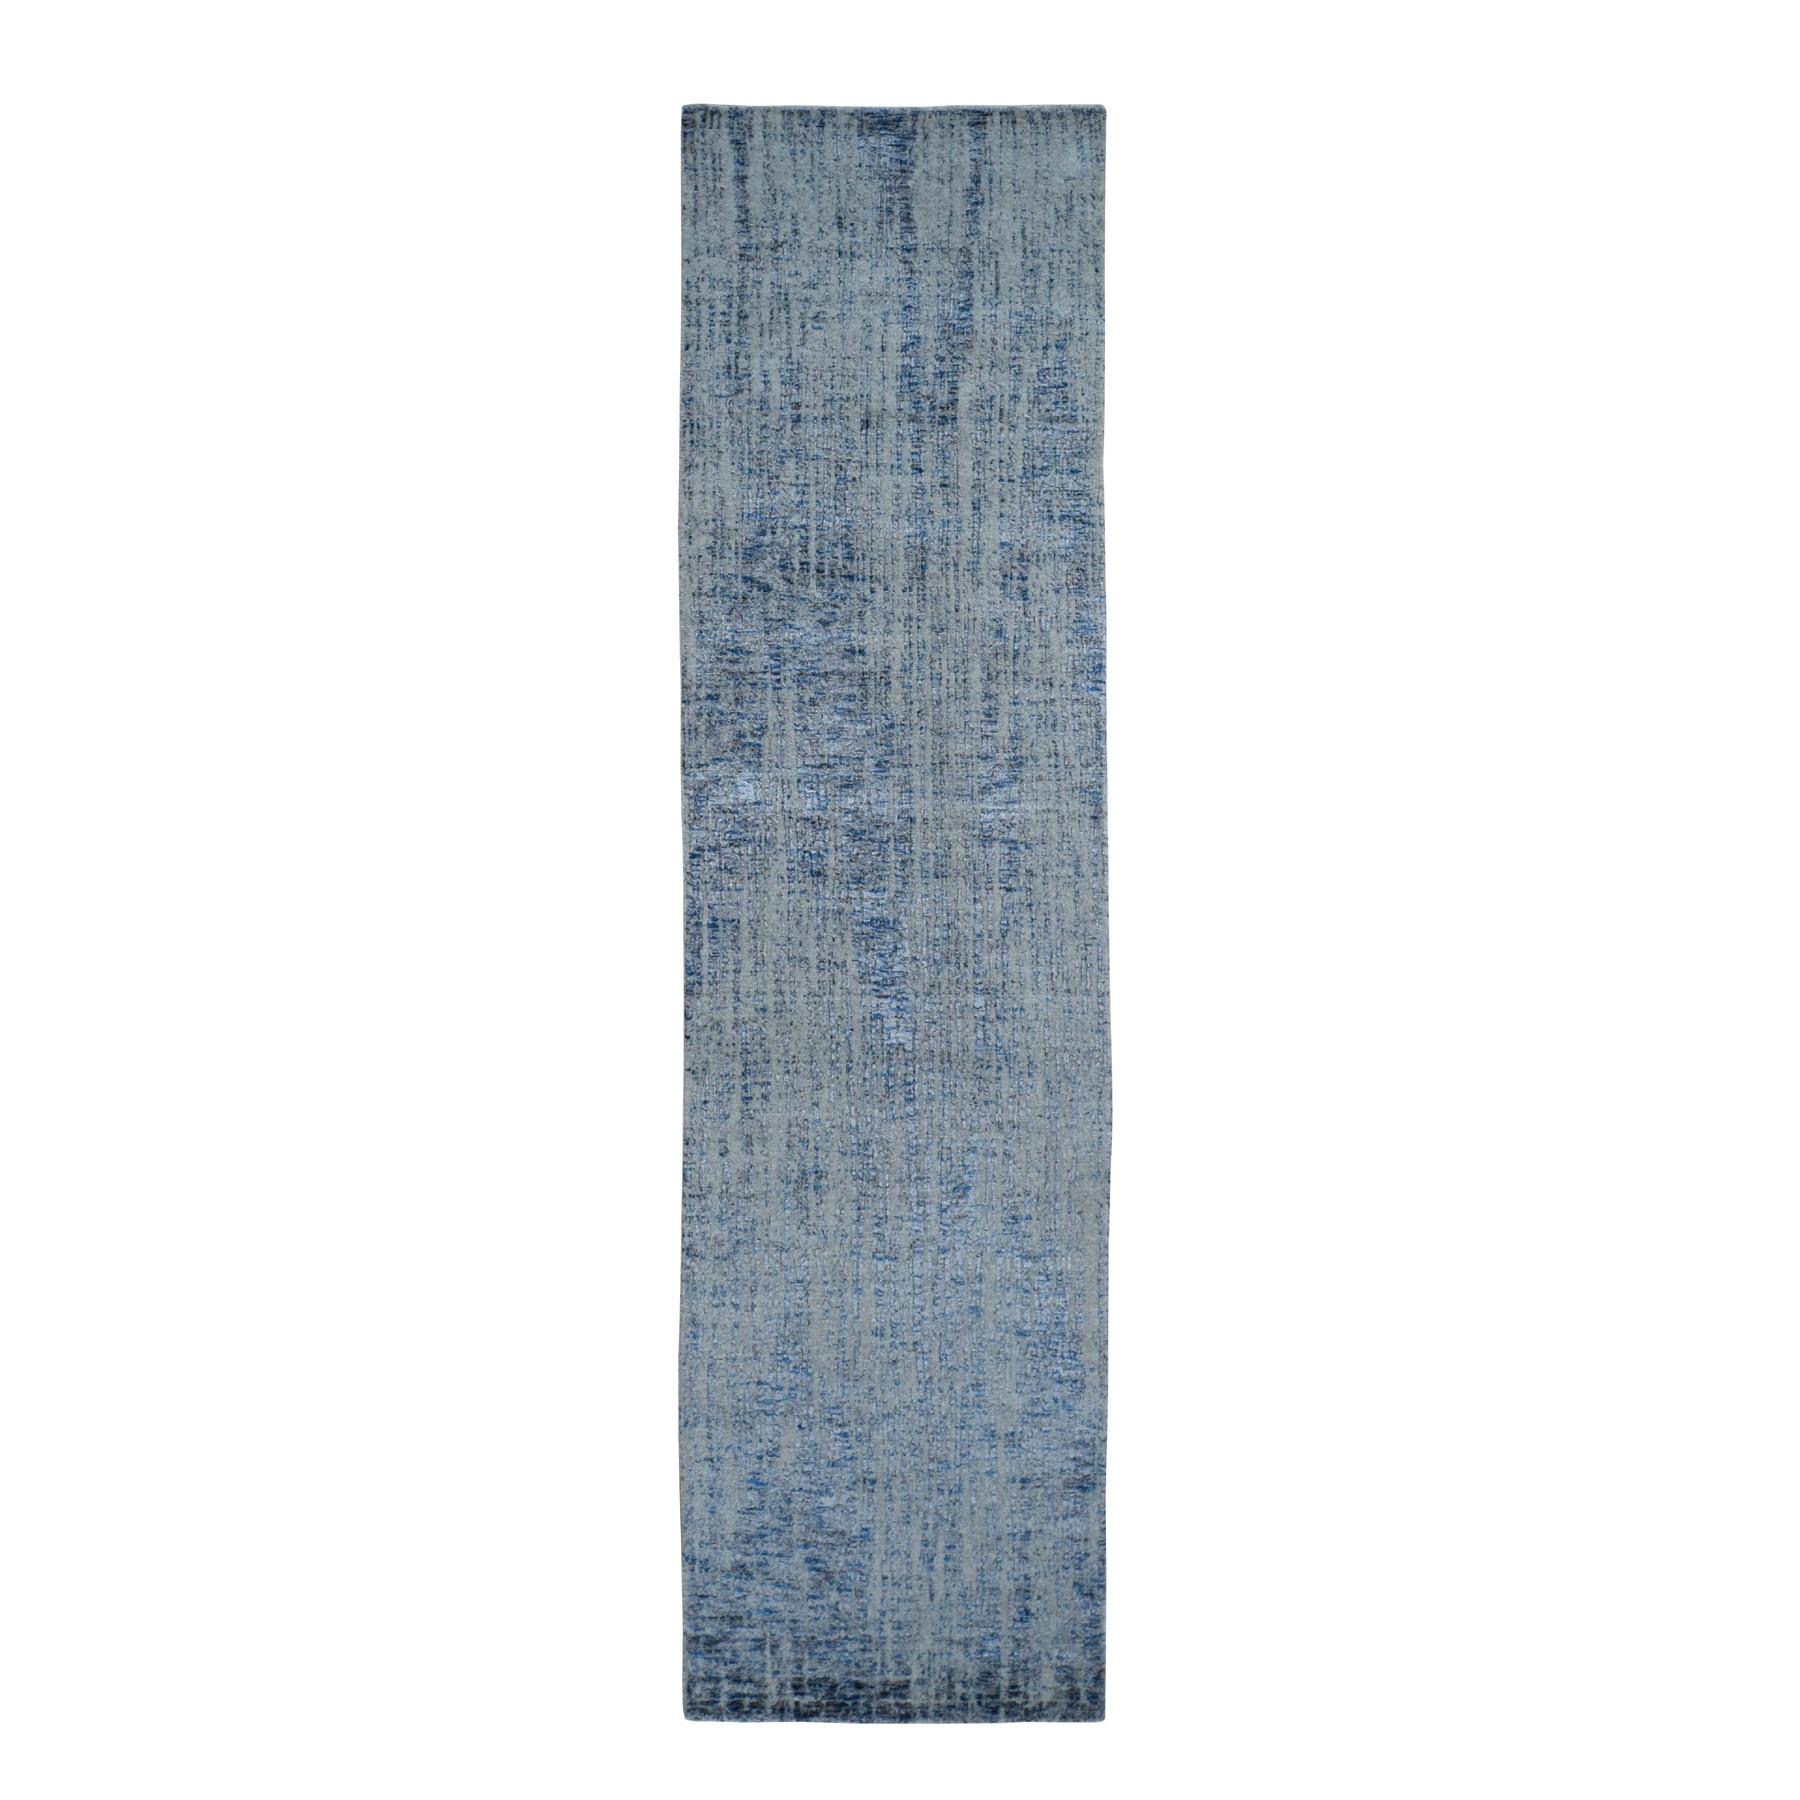 "2'6""x7'10"" Gray Fine jacquard Hand-Loomed Modern Runner Wool And Silk Oriental Rug"